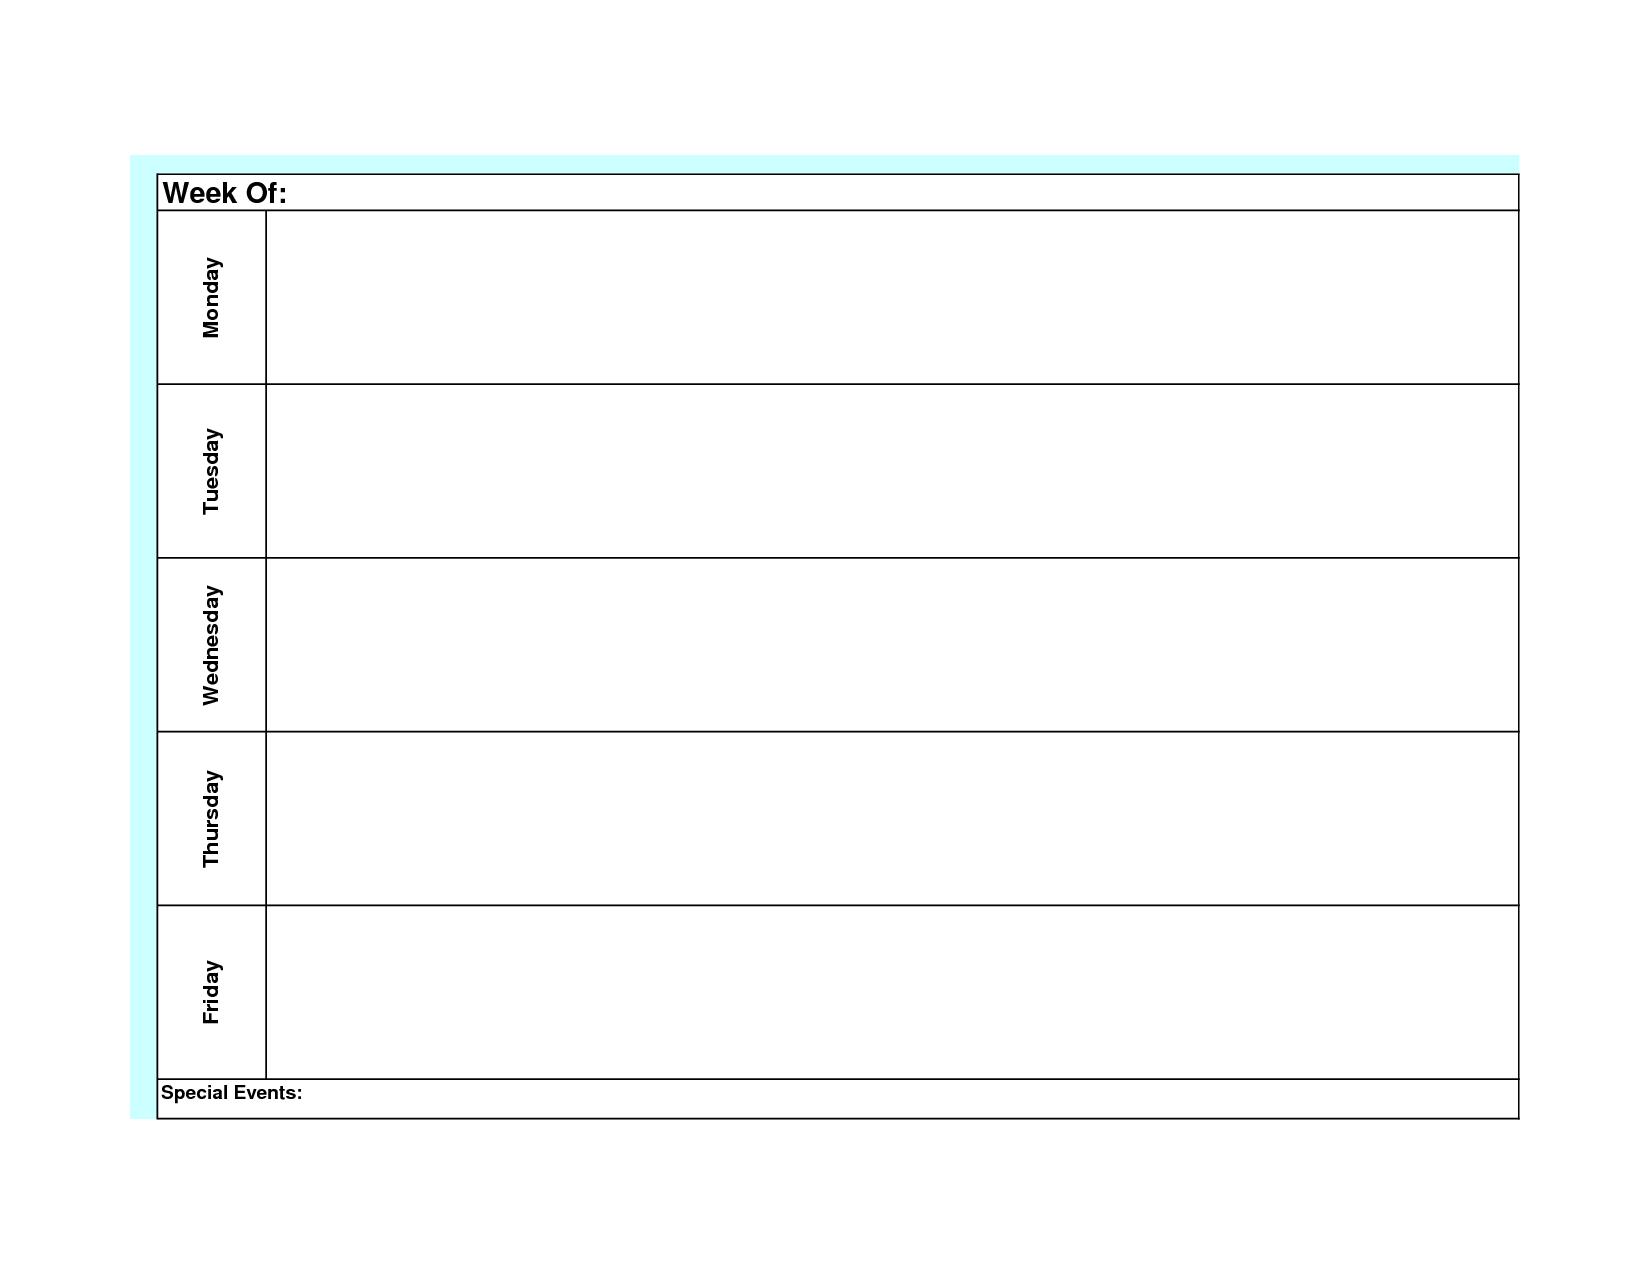 Blank Weekly Calendar Template Monday Friday (With Images Monday – Friday Schedule Blank Template